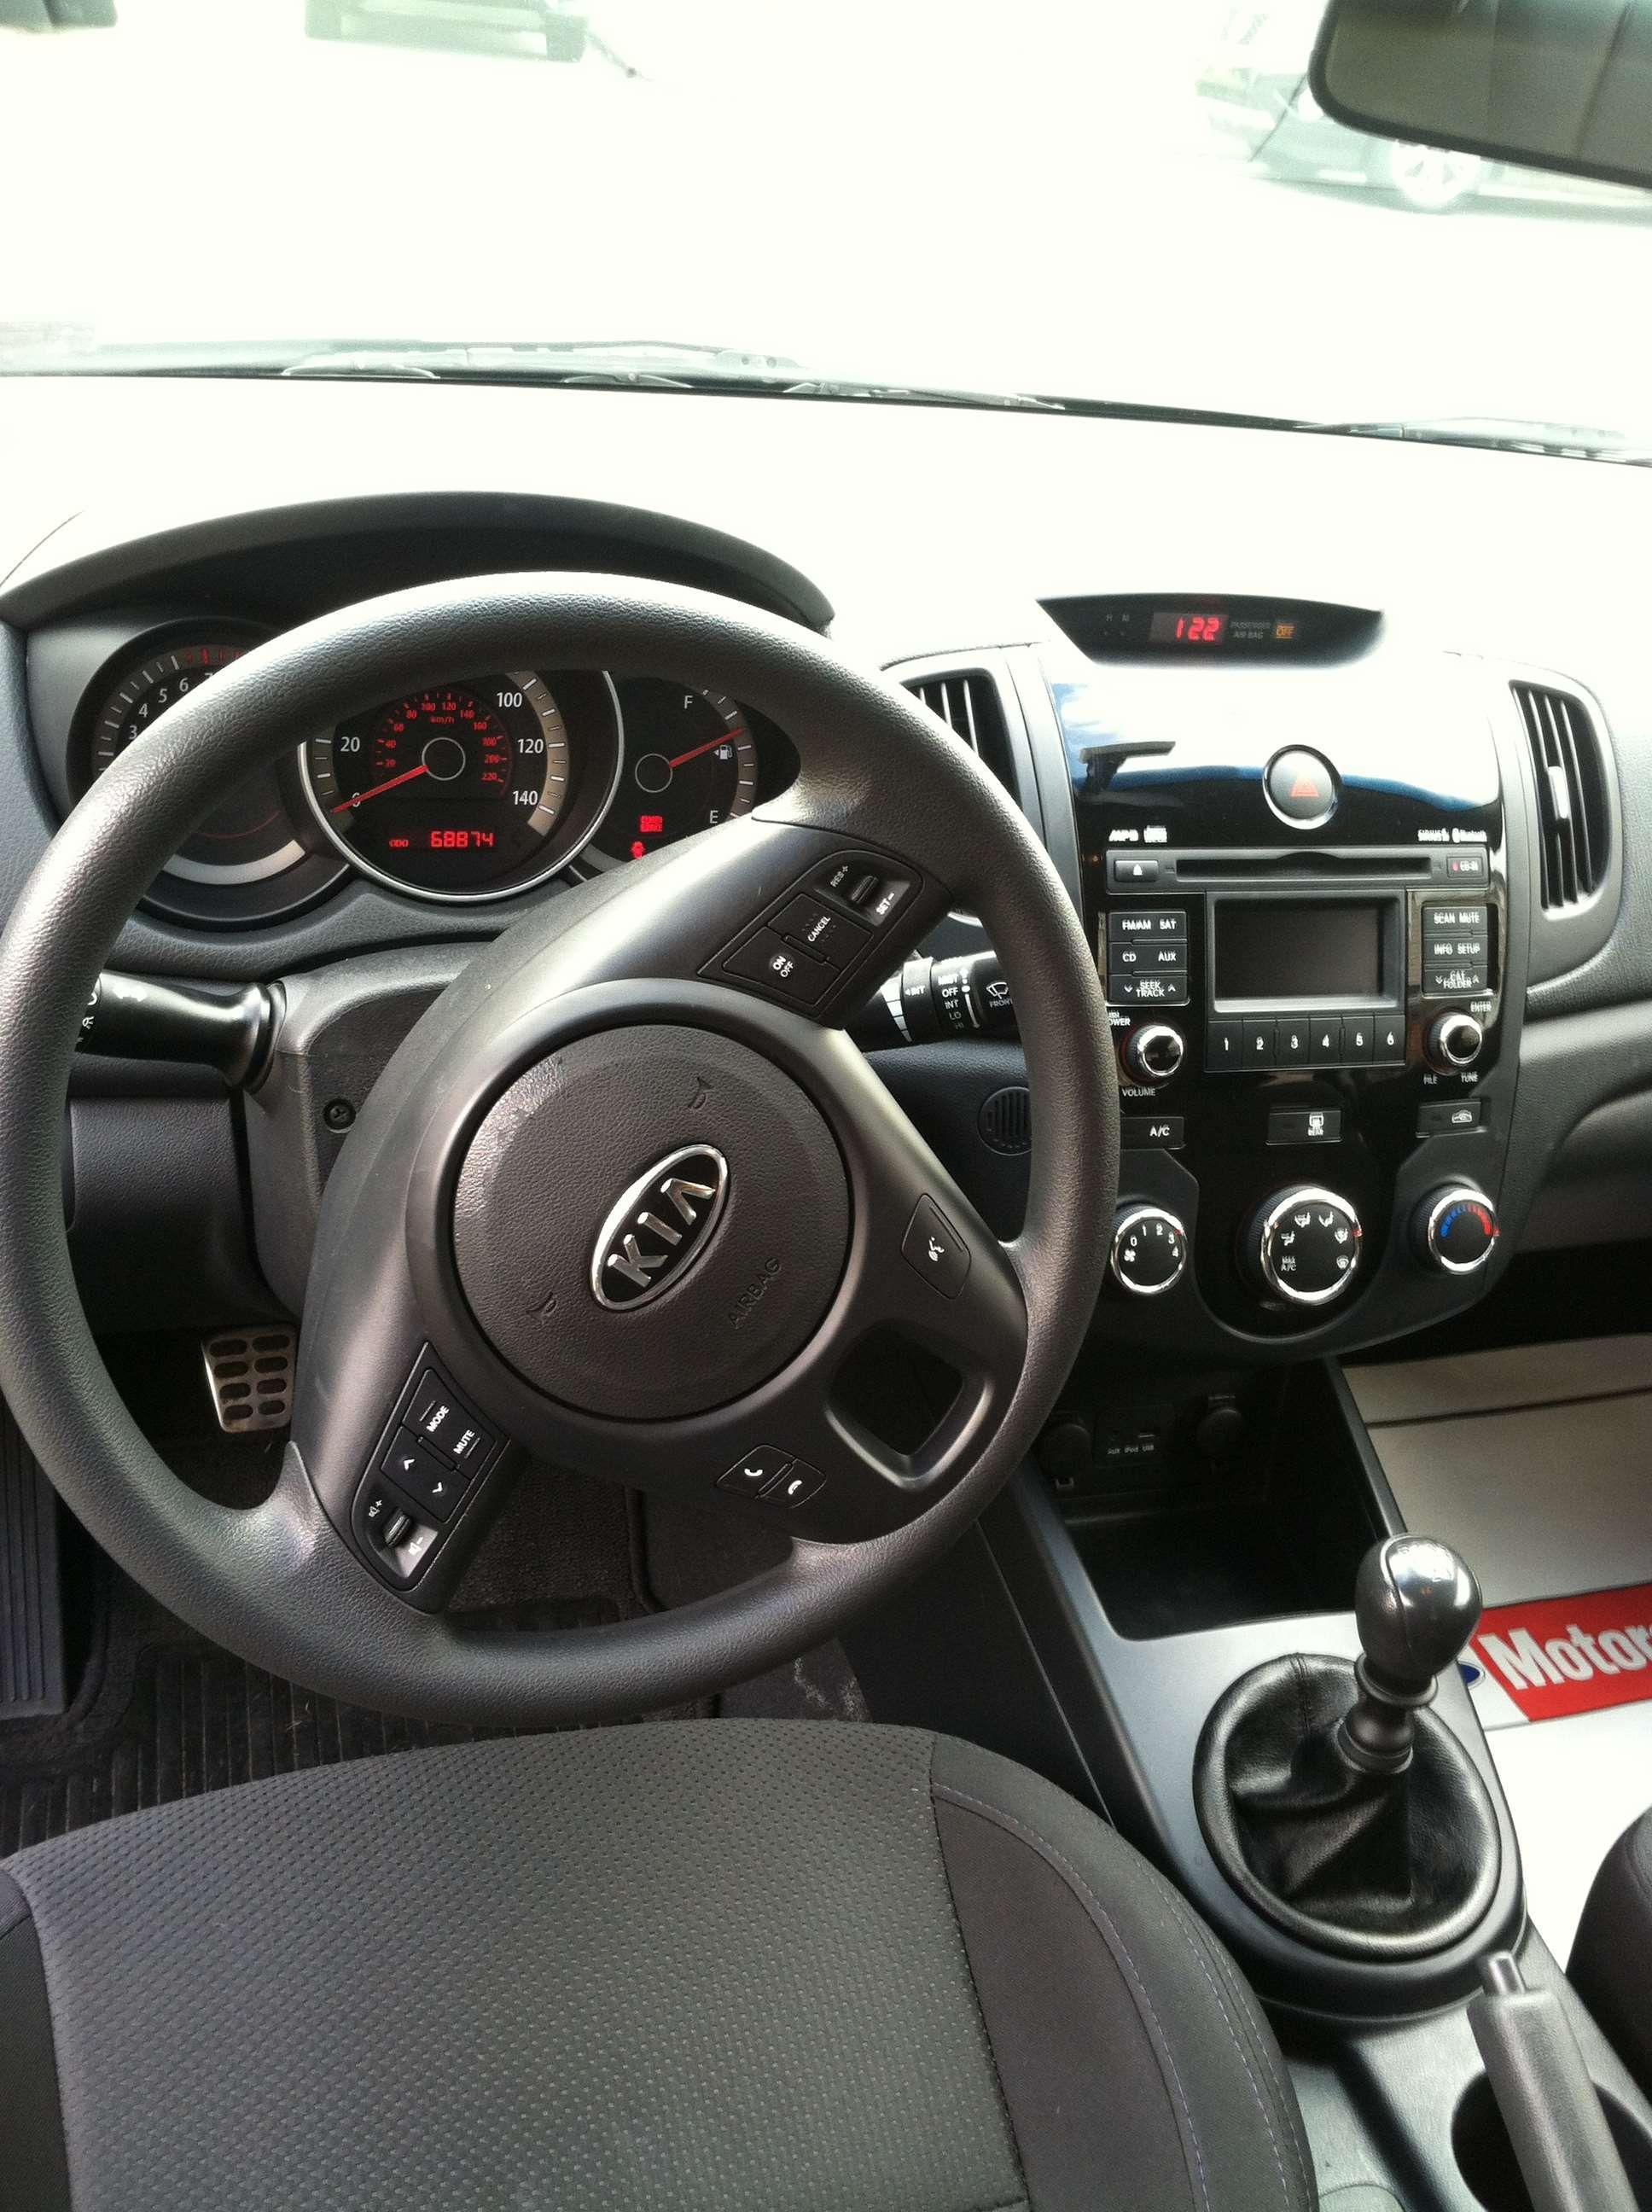 Make Kia Model Forte Year 2010 Exterior Color Black Interior